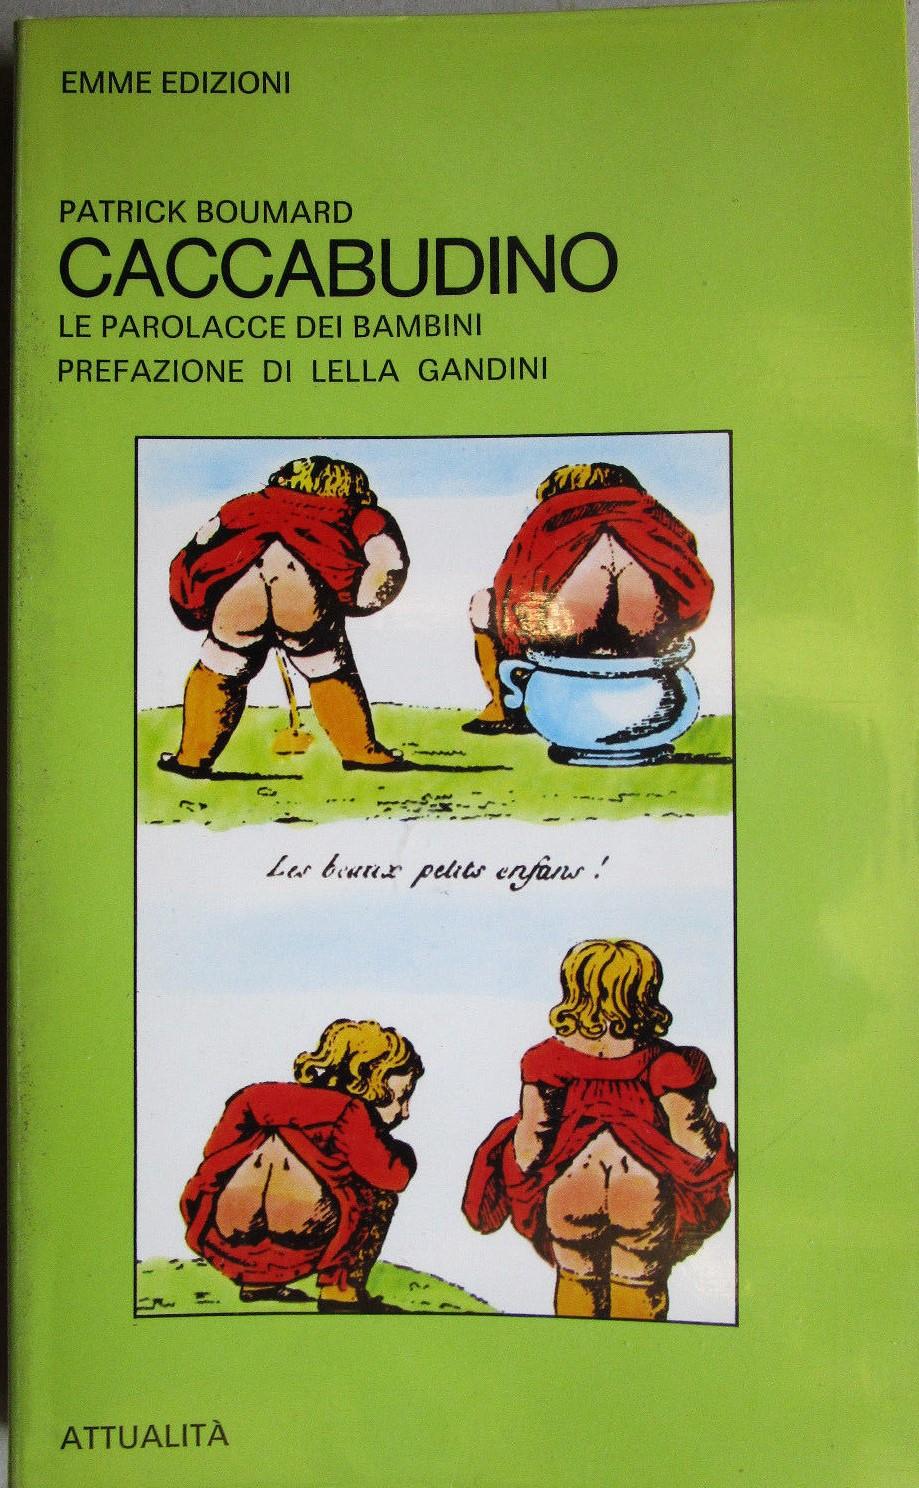 Caccabudino